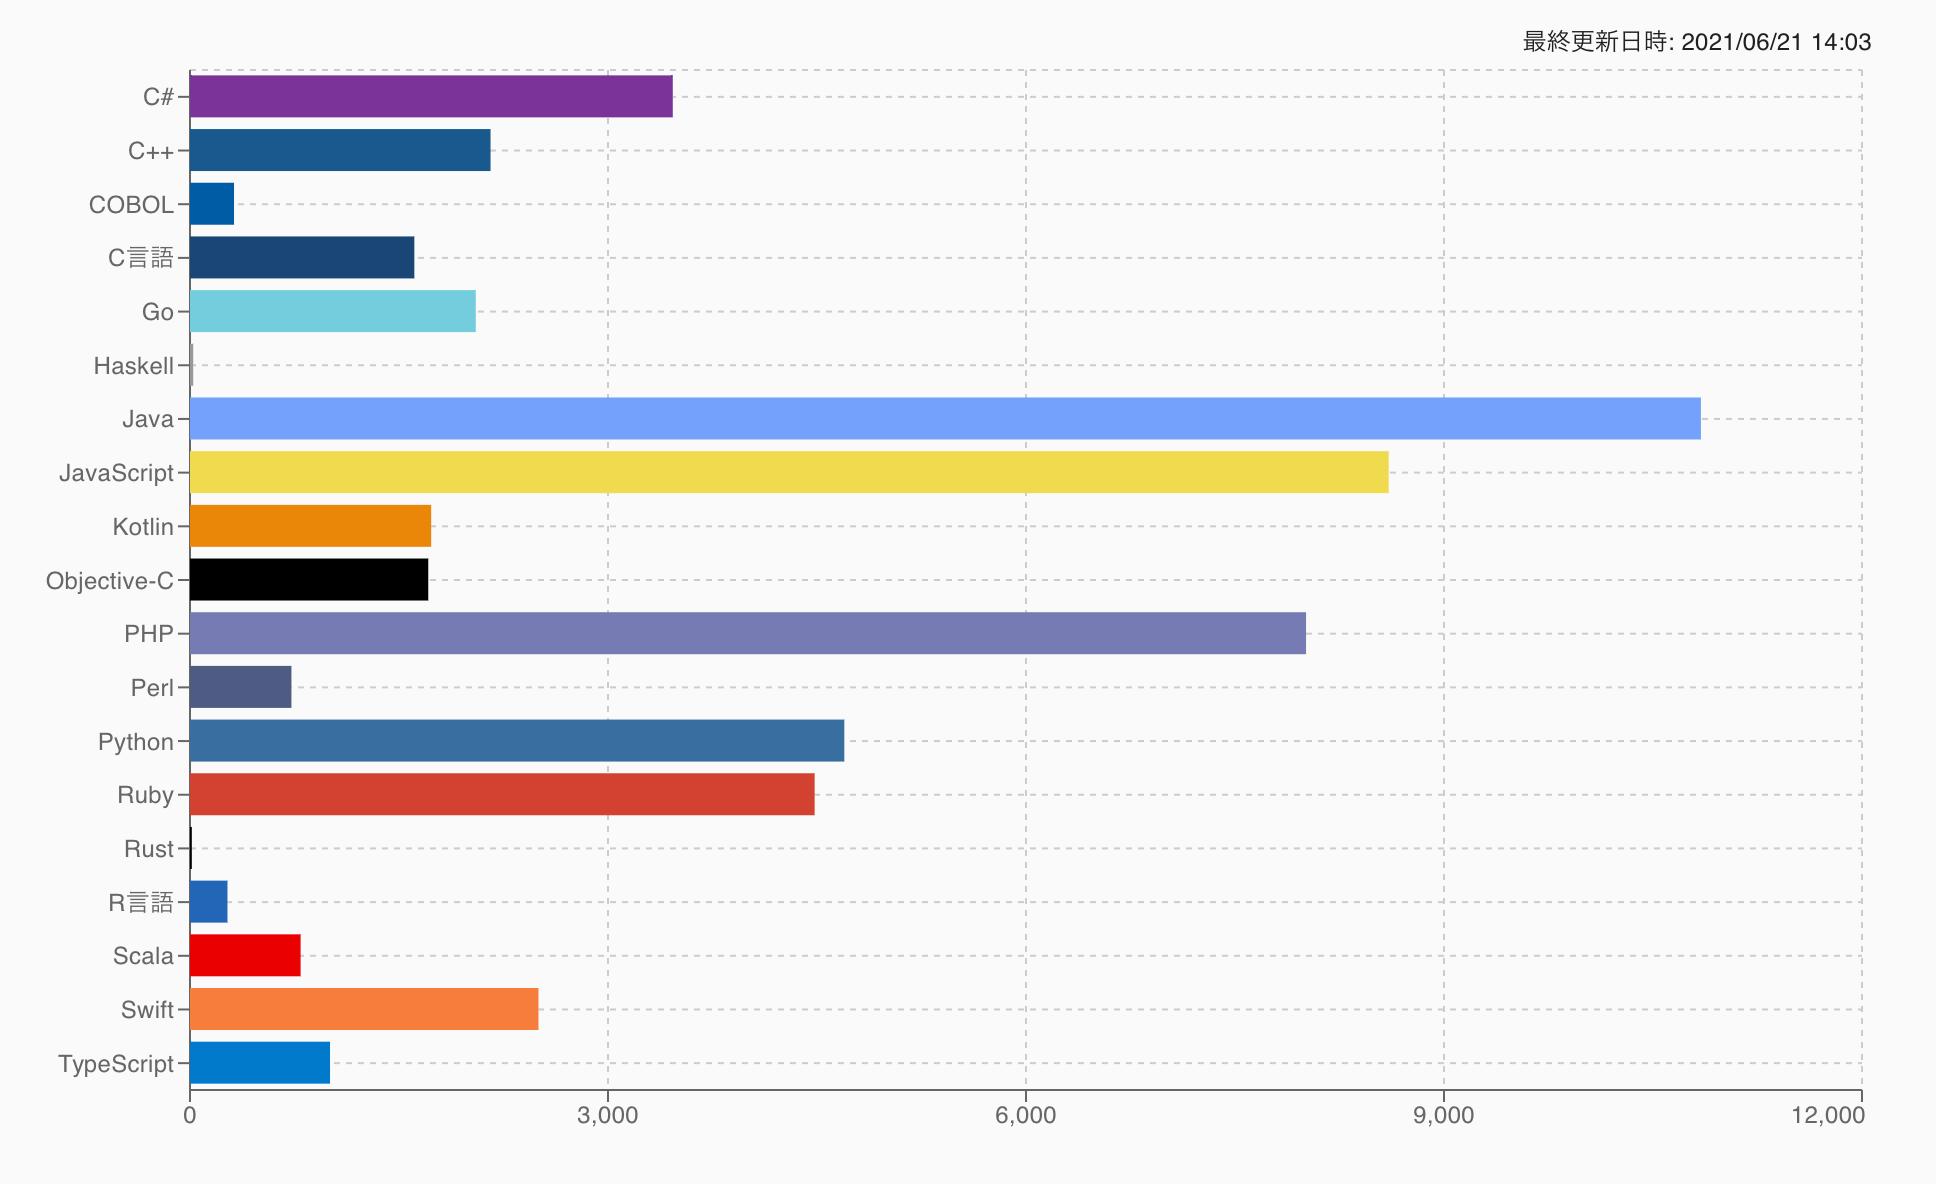 Nojovによるプログラミング言語ごとの求人数